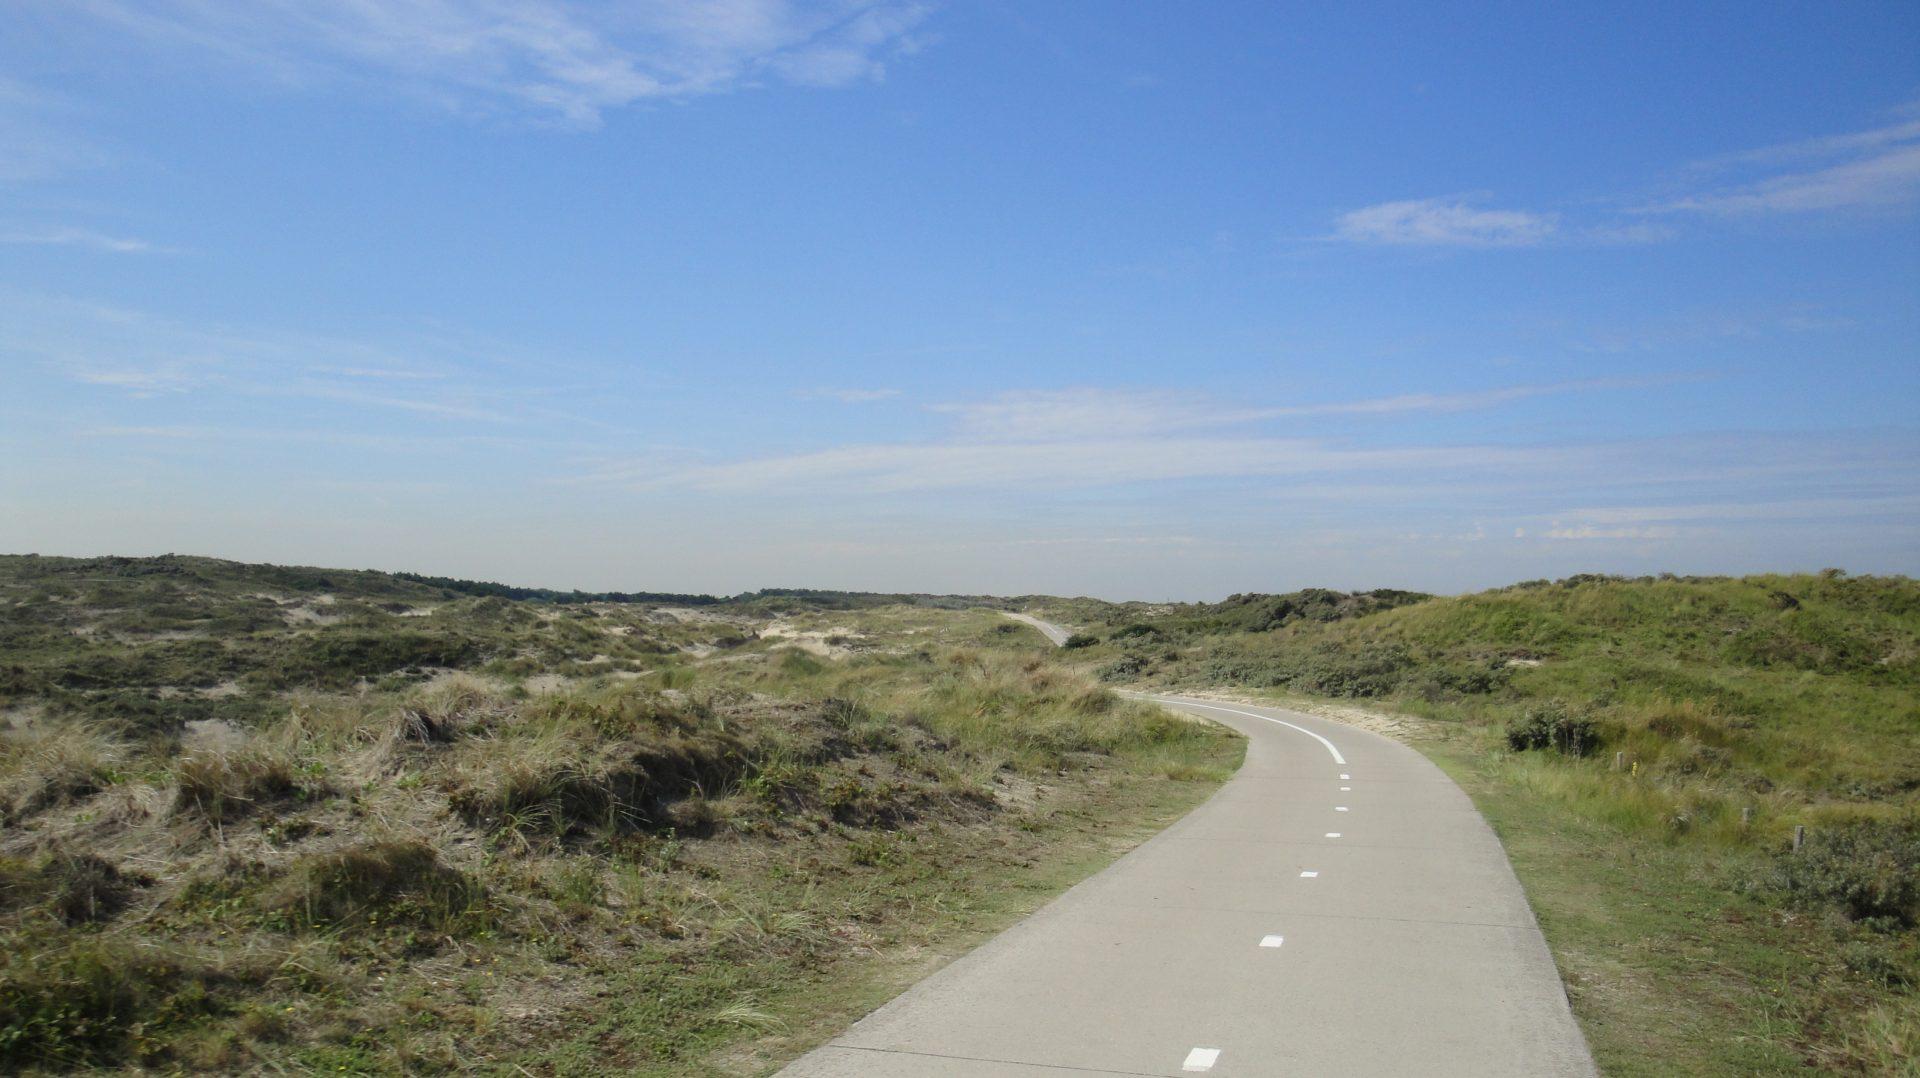 velovia Beratung für Fahrradtourismus